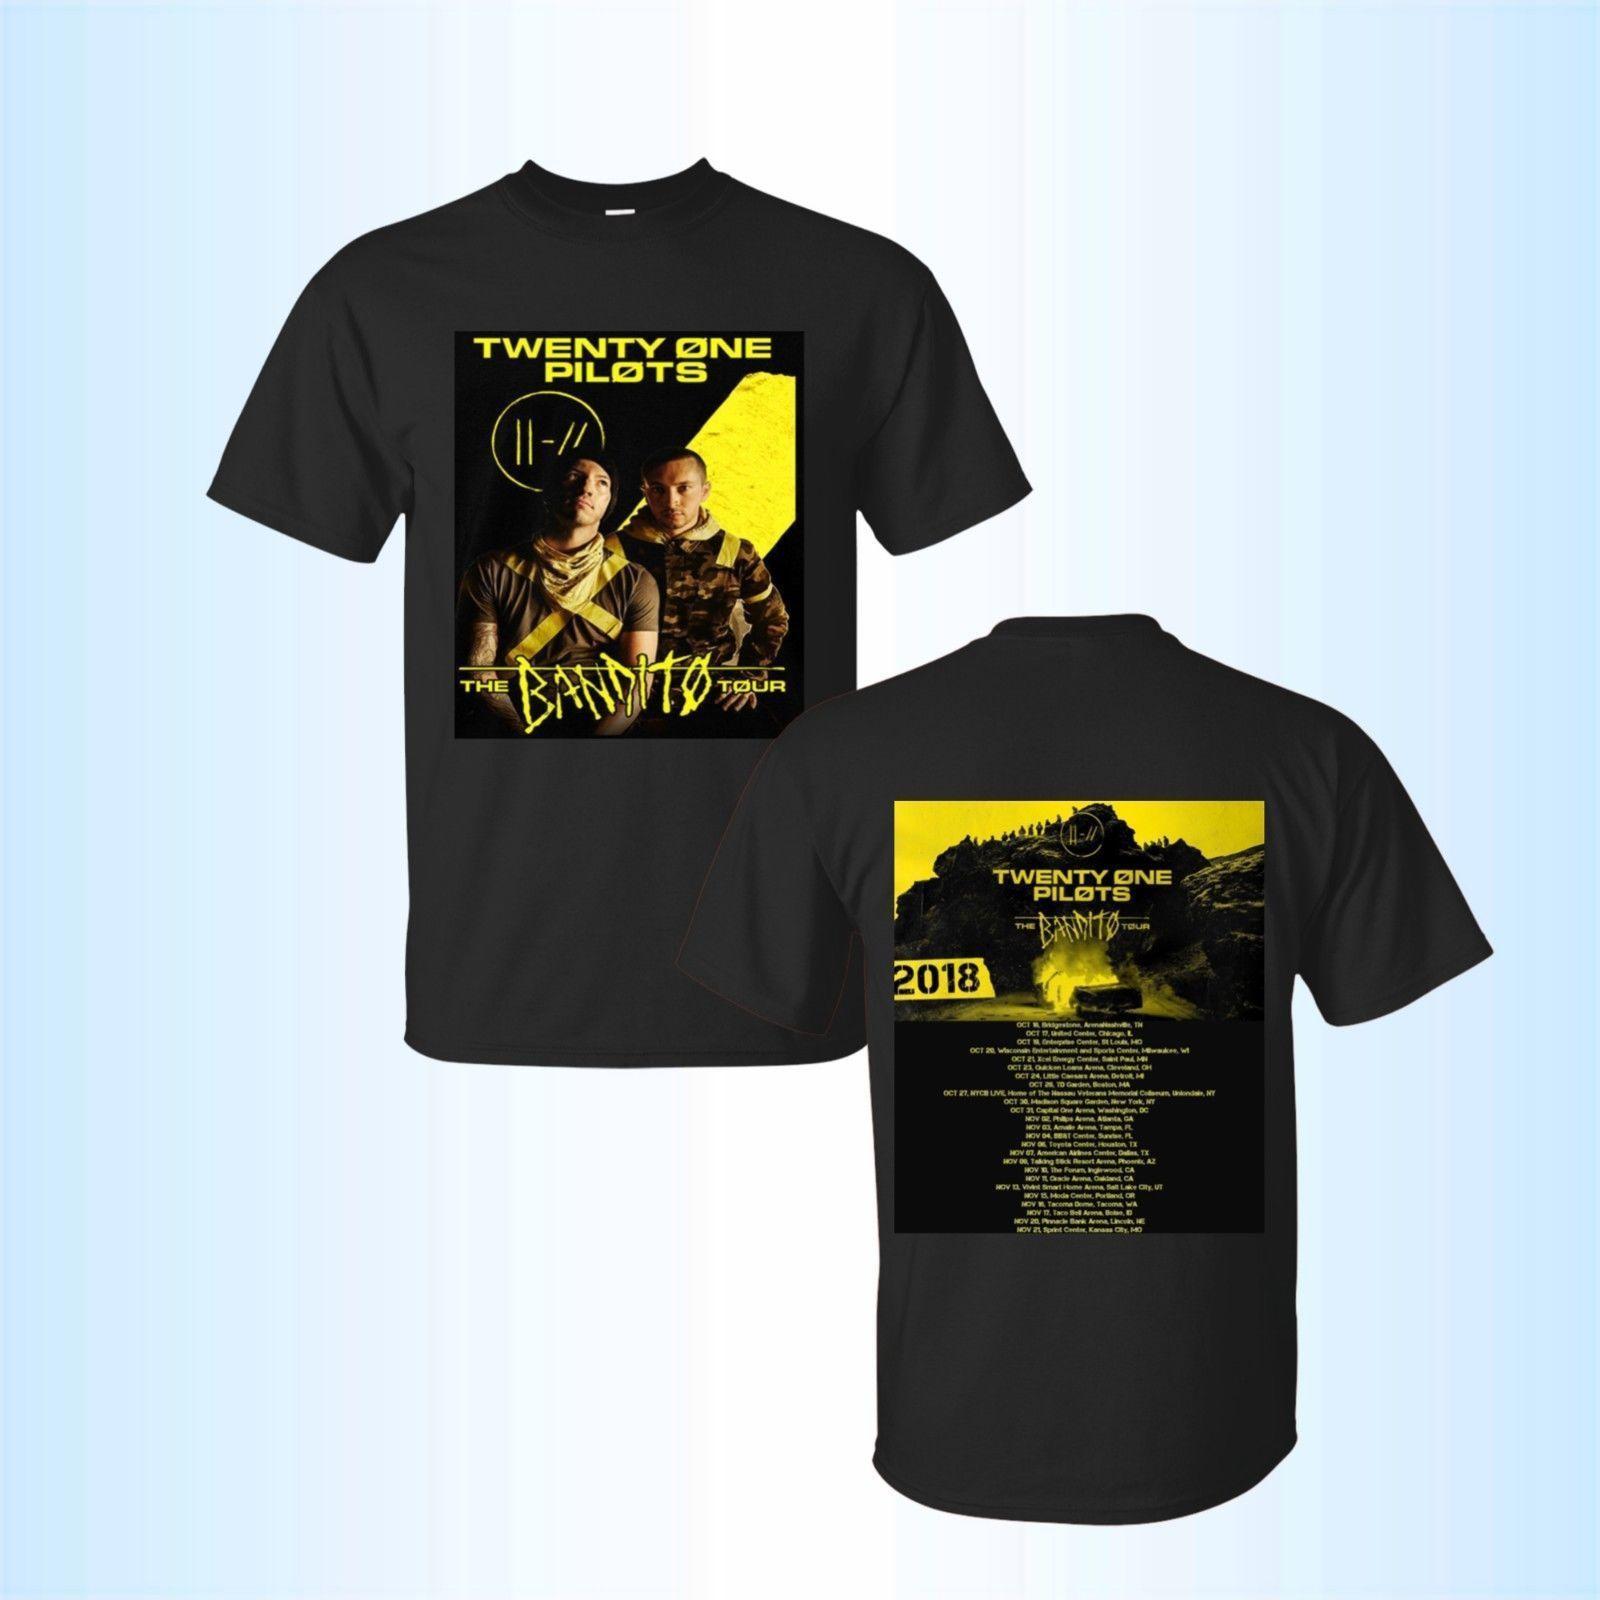 c499f91ad76d0 Compre Nuevo Twenty One Pilots BANDITO Tour 2018 Camiseta Negra Tamaño  Completo 2018 Camiseta De Moda 100% Algodón Camiseta Tops Camiseta Al Por  Mayor A ...